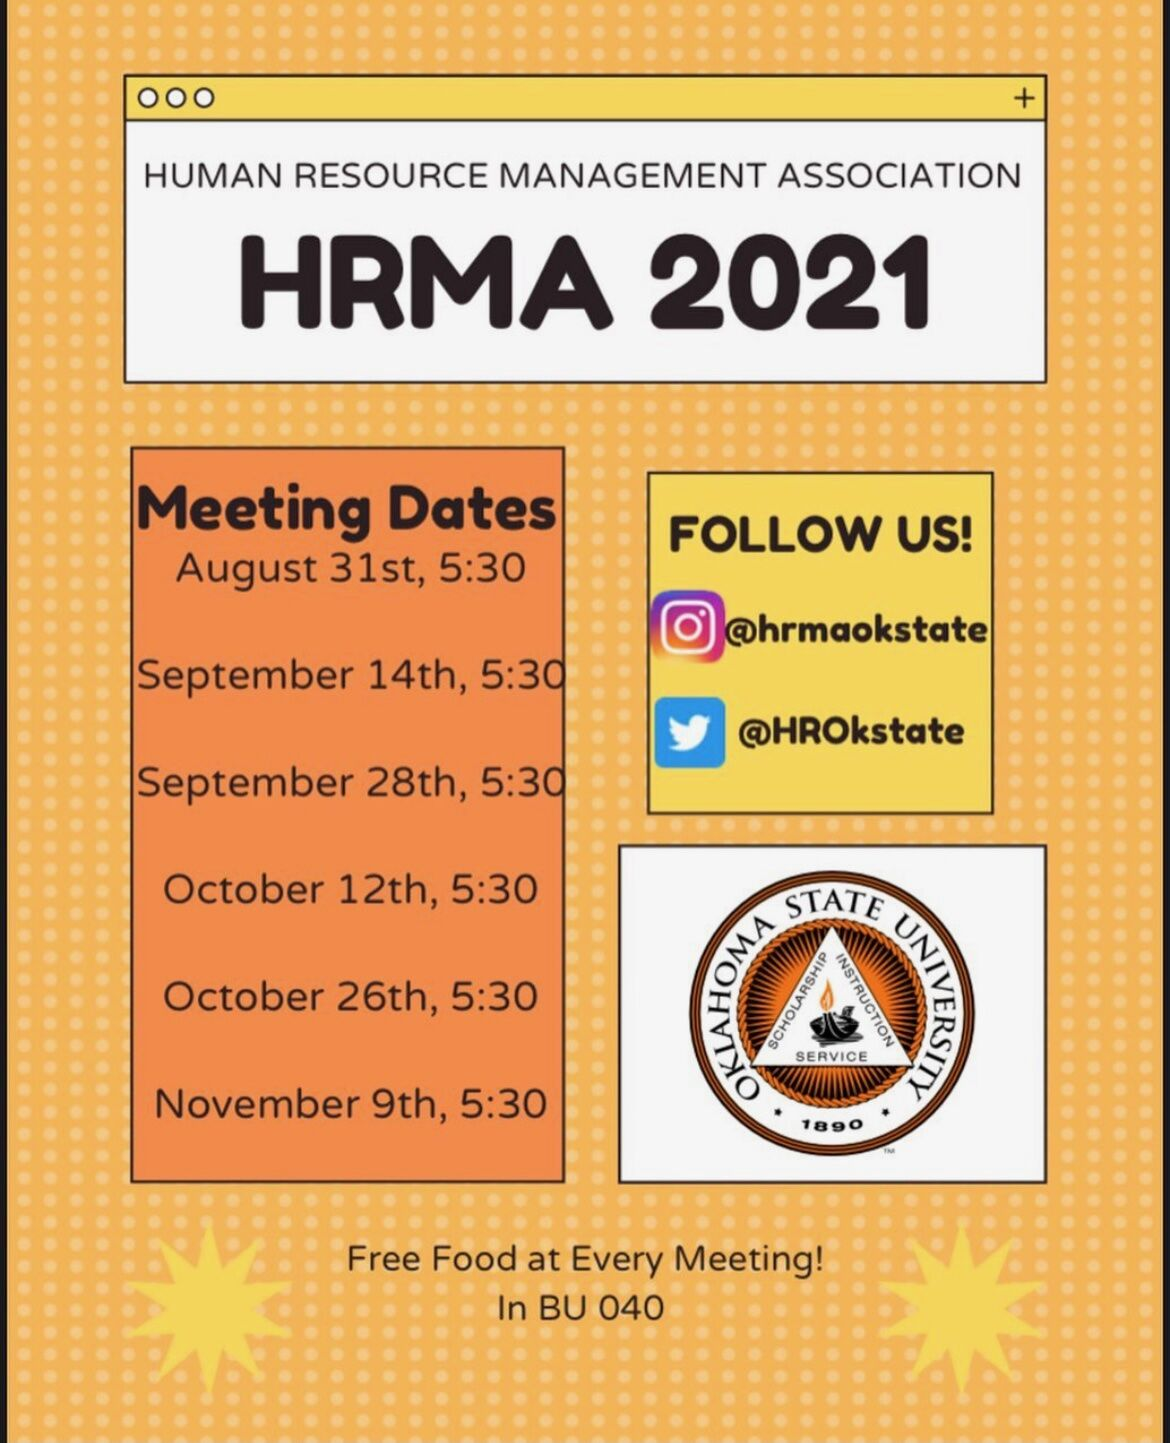 human resources management association 1